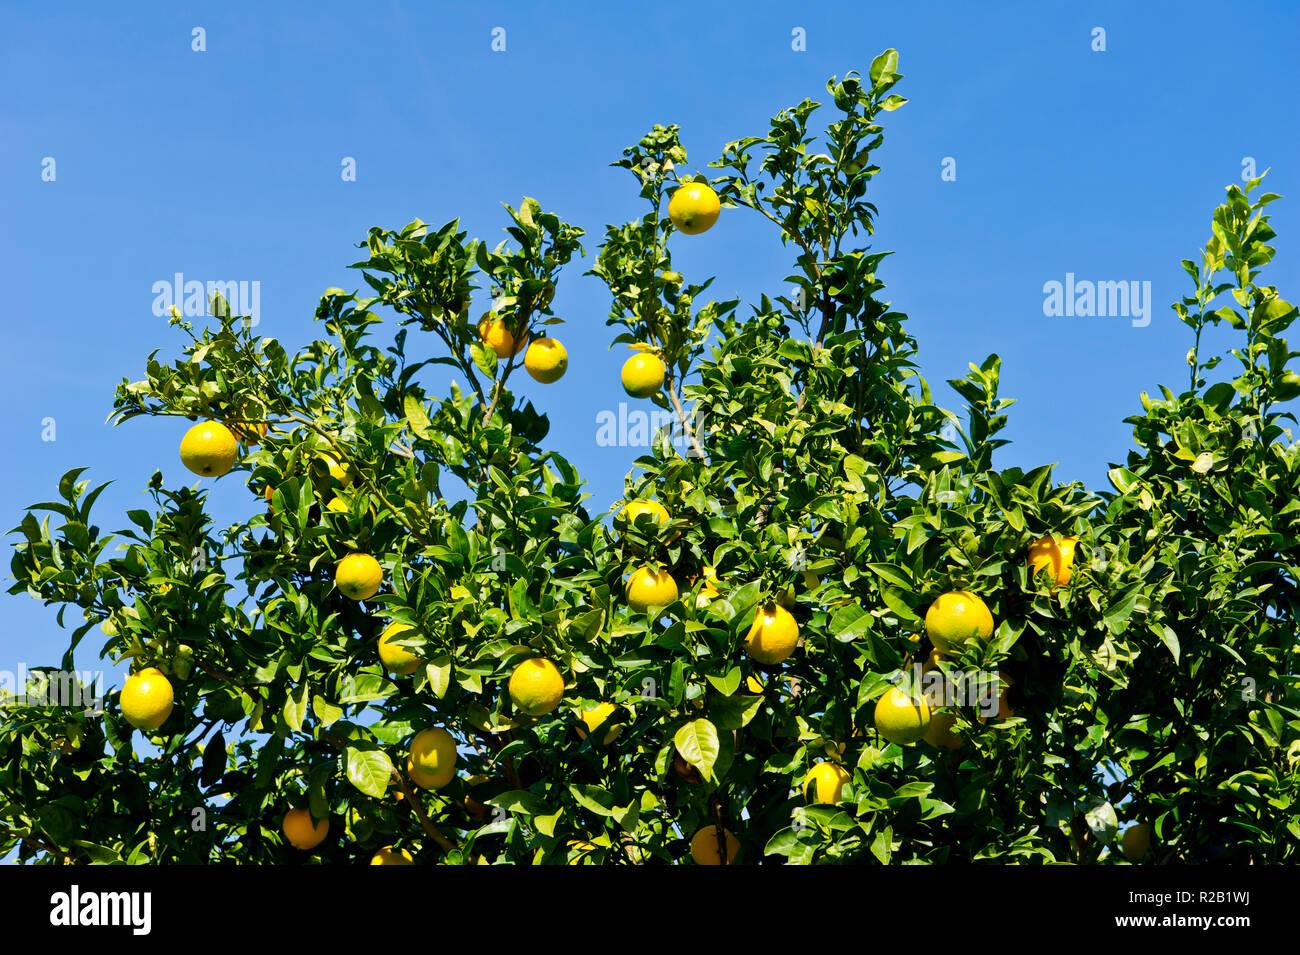 Lemon tree, near Alte, Algarve, Portugal - Stock Image